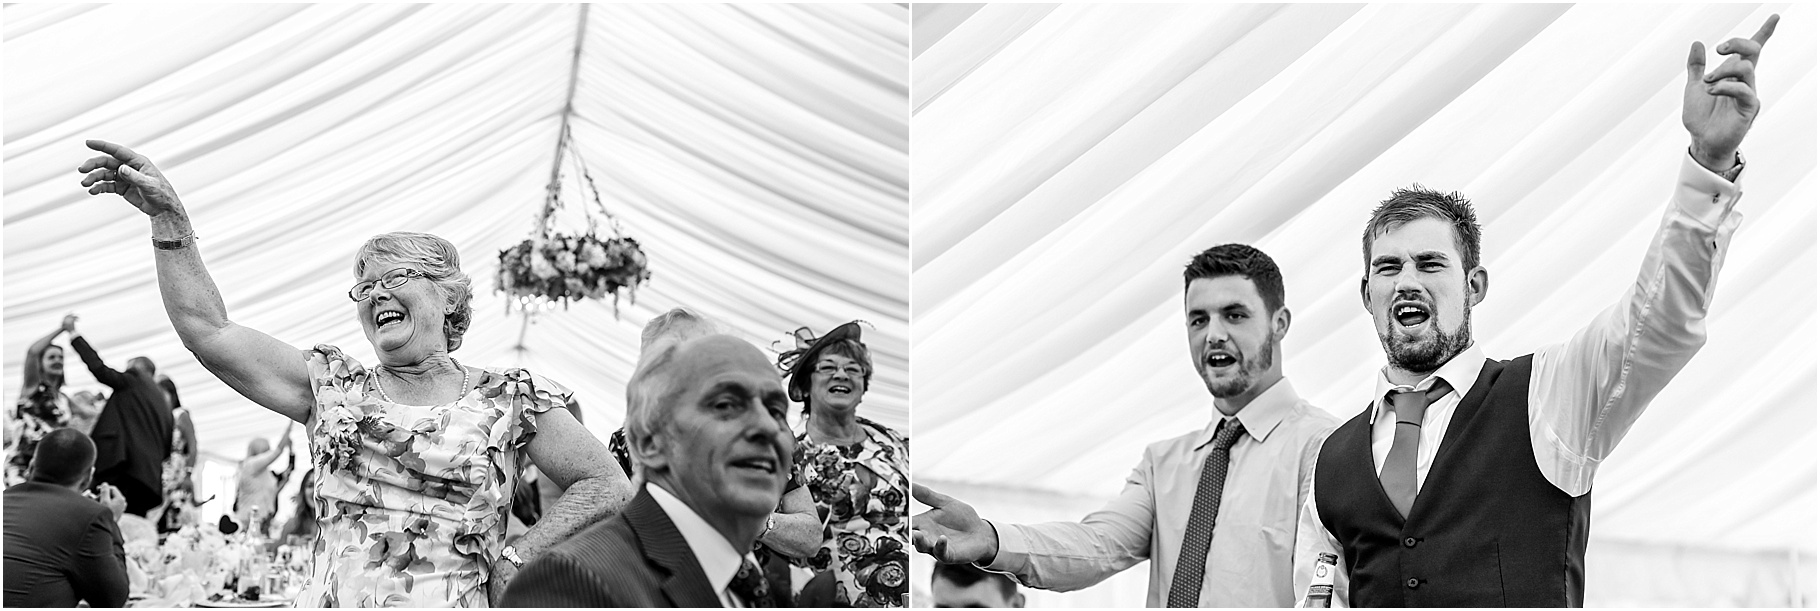 lancashire-marquee-wedding-067.jpg